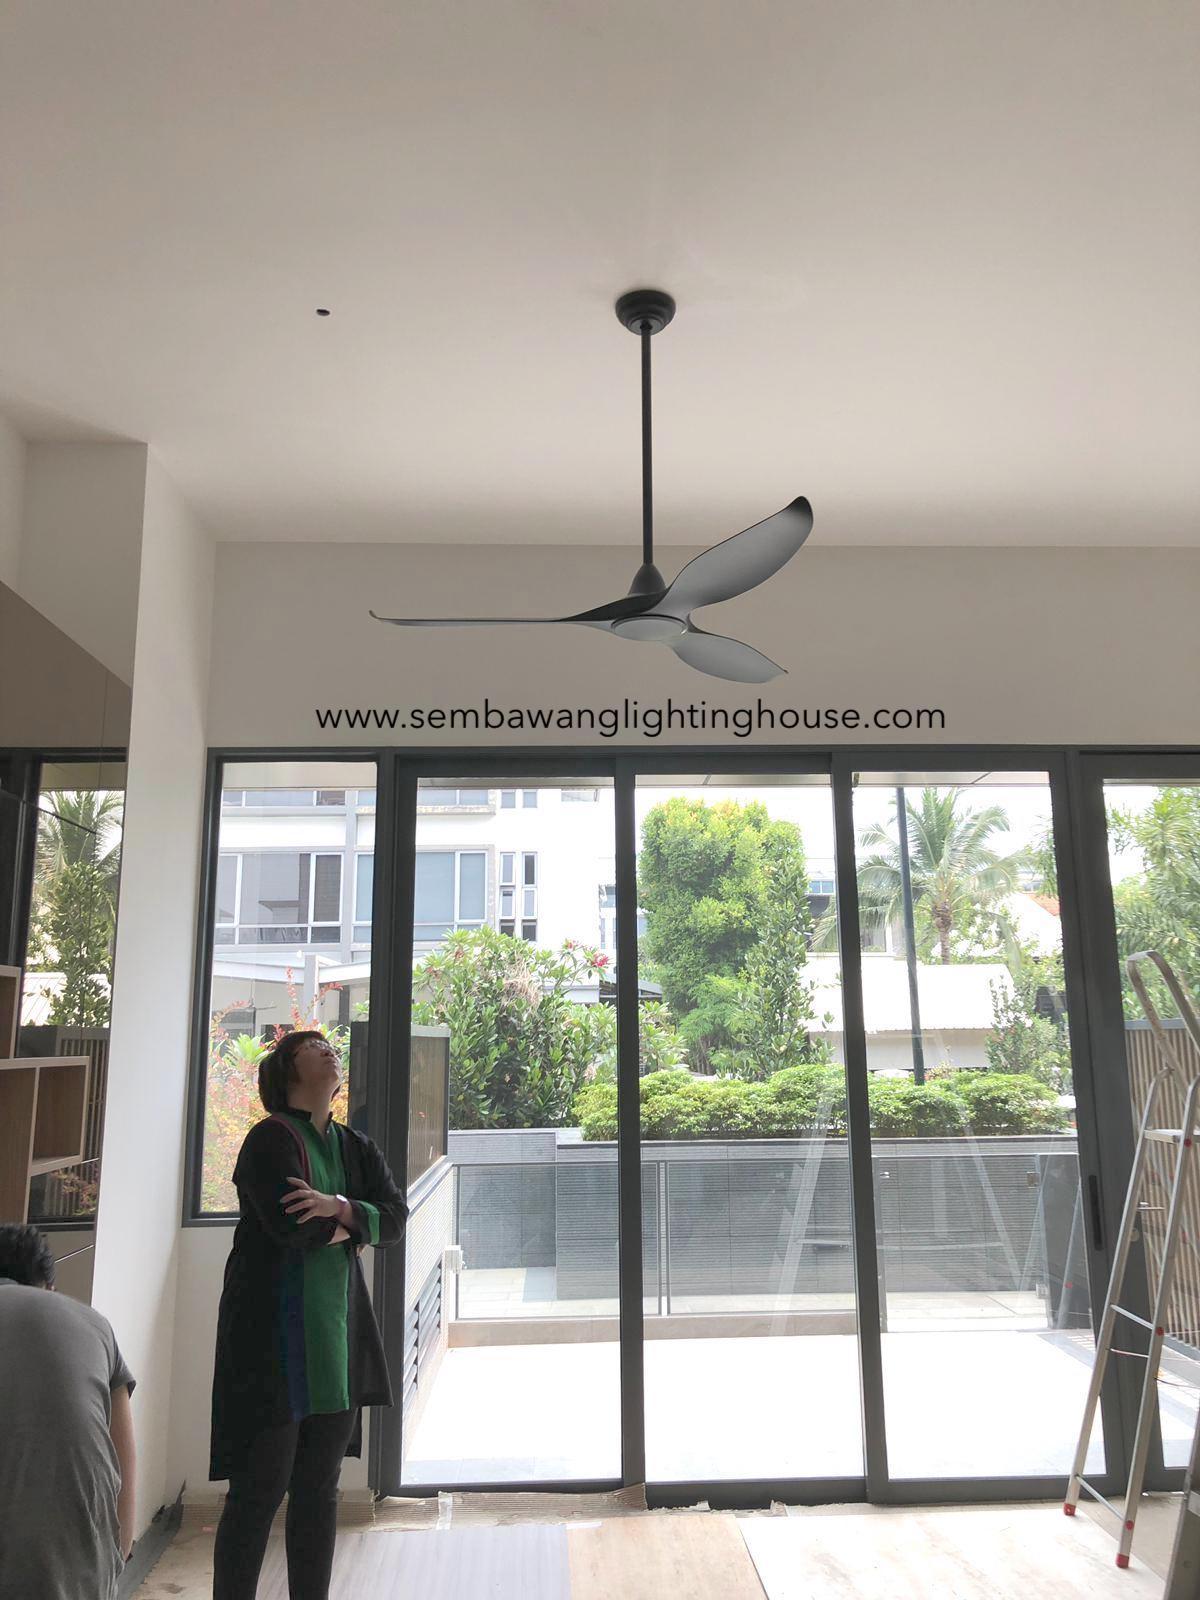 efenz-rod-ceiling-fan-without-light-black-sembawang-lighting-house-07.jpeg